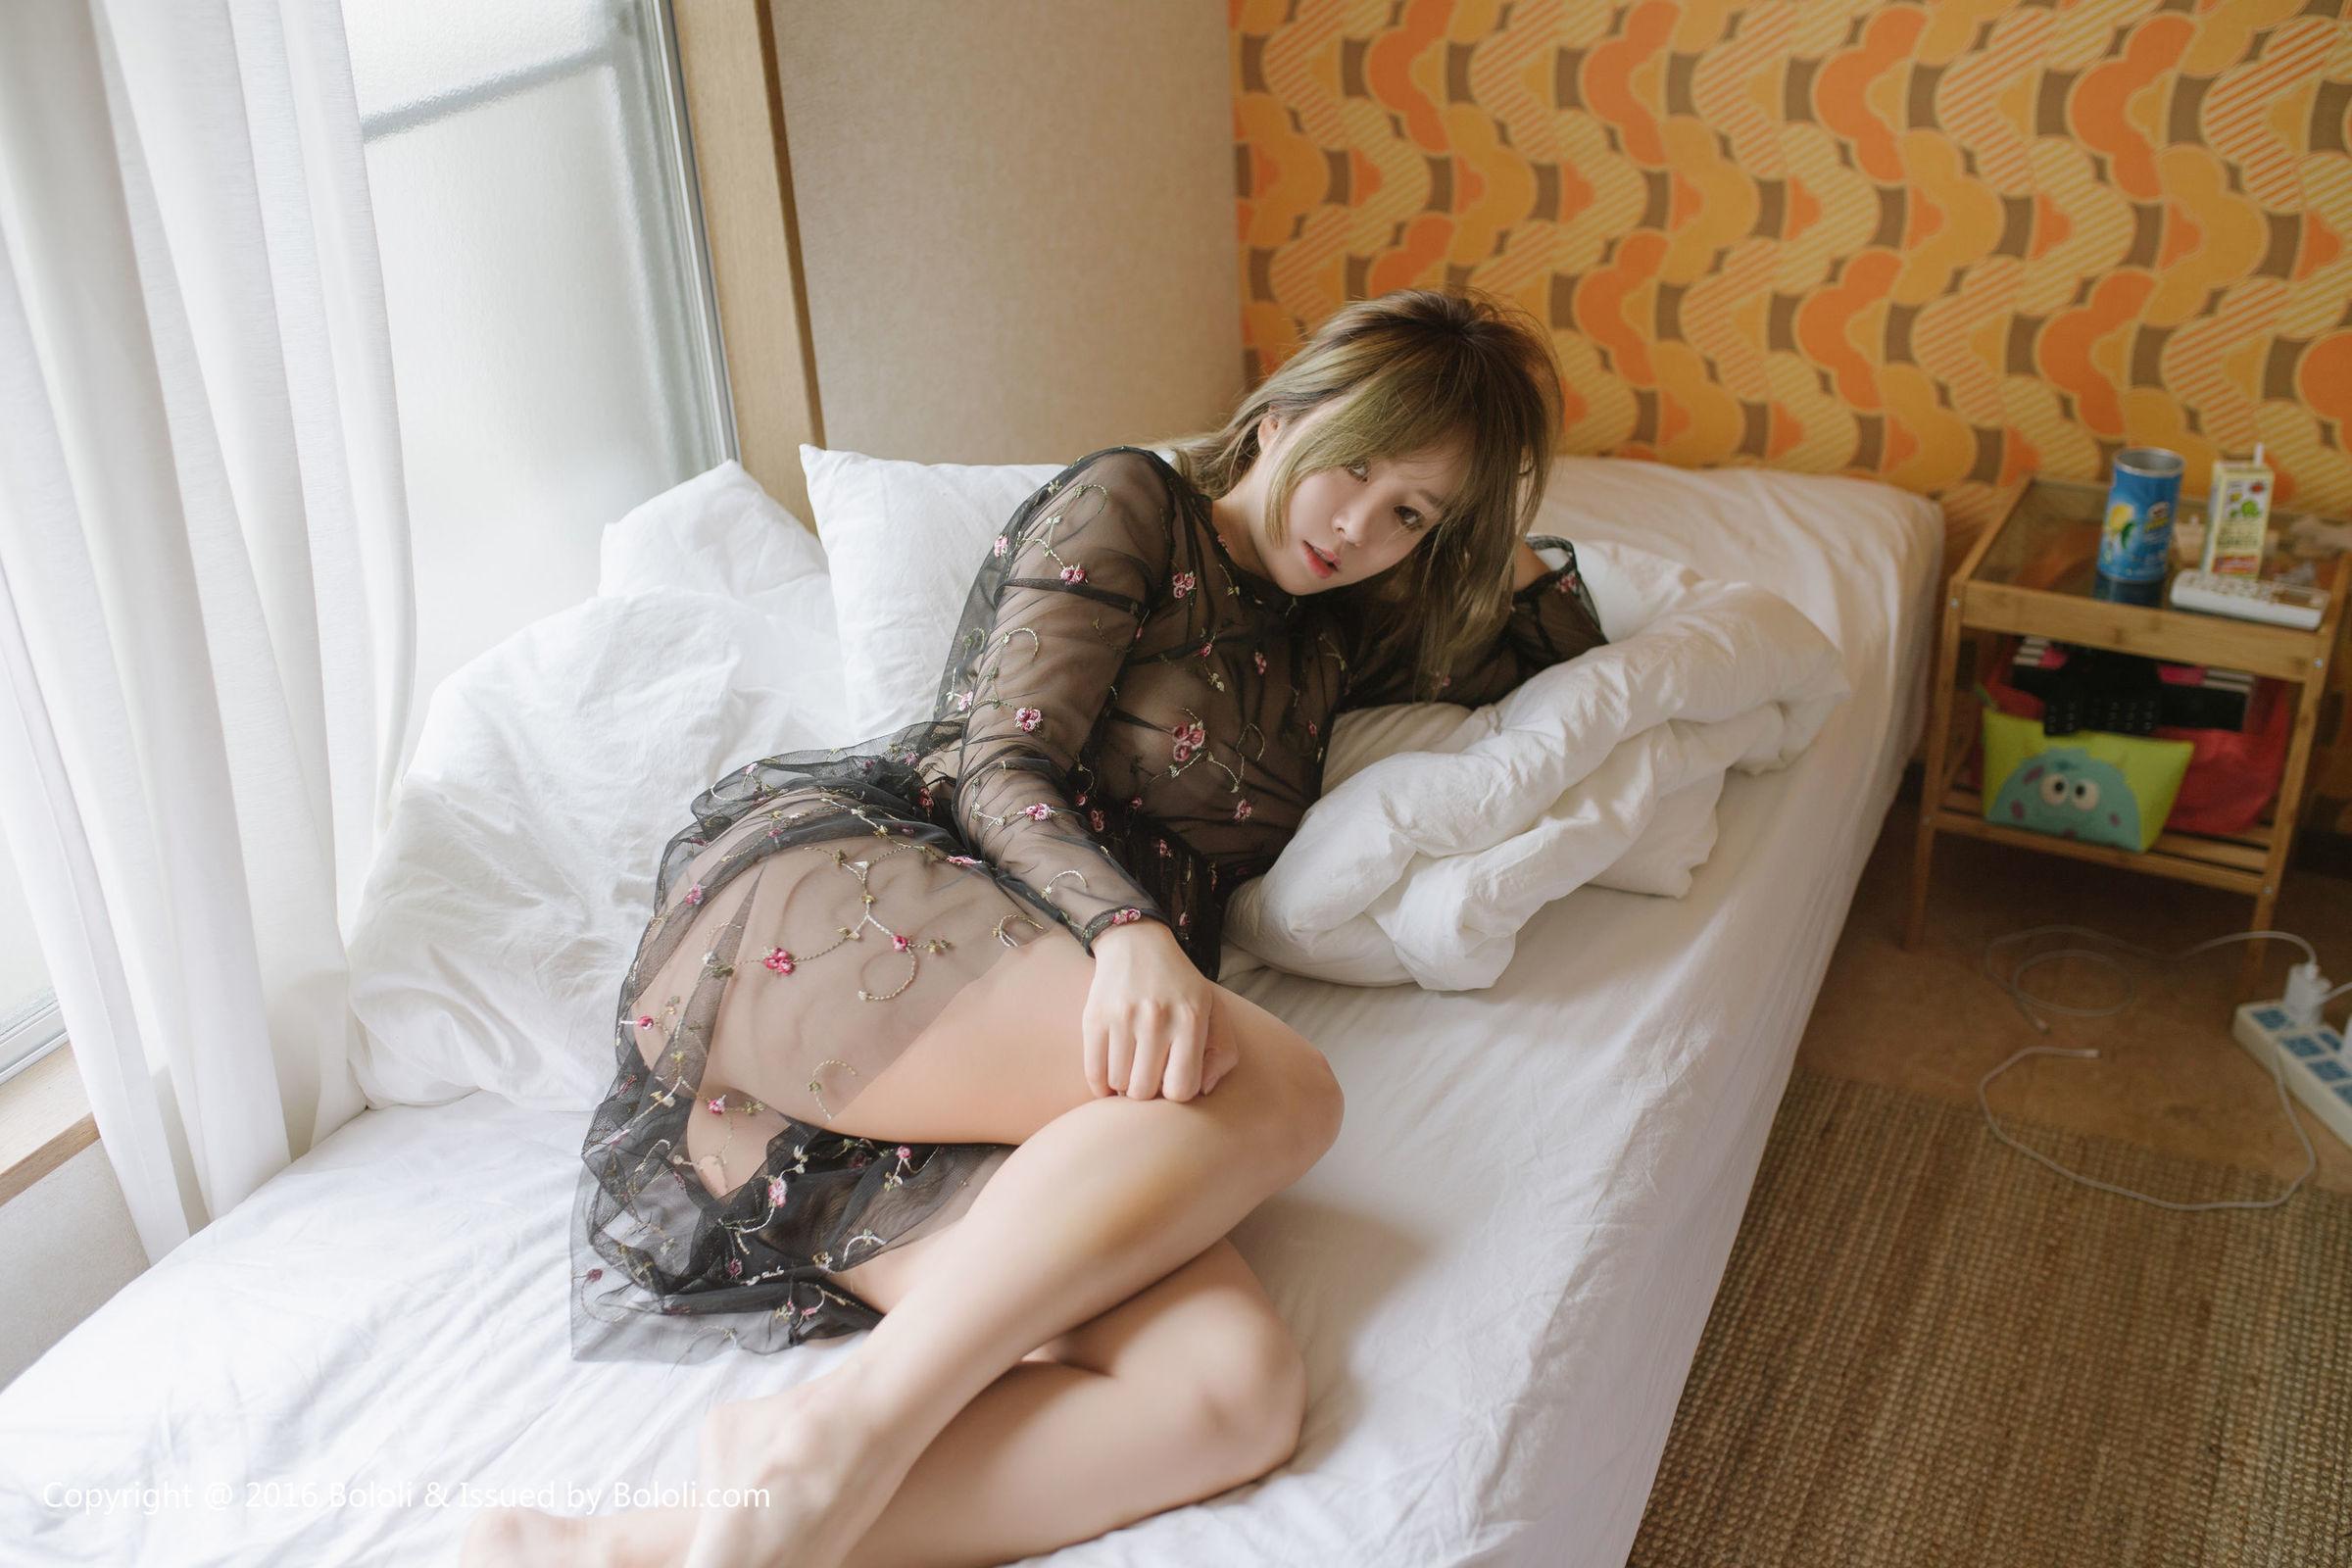 [Bololi波萝社] BOL.098 王雨纯 - 纱裙性感少女[55P]